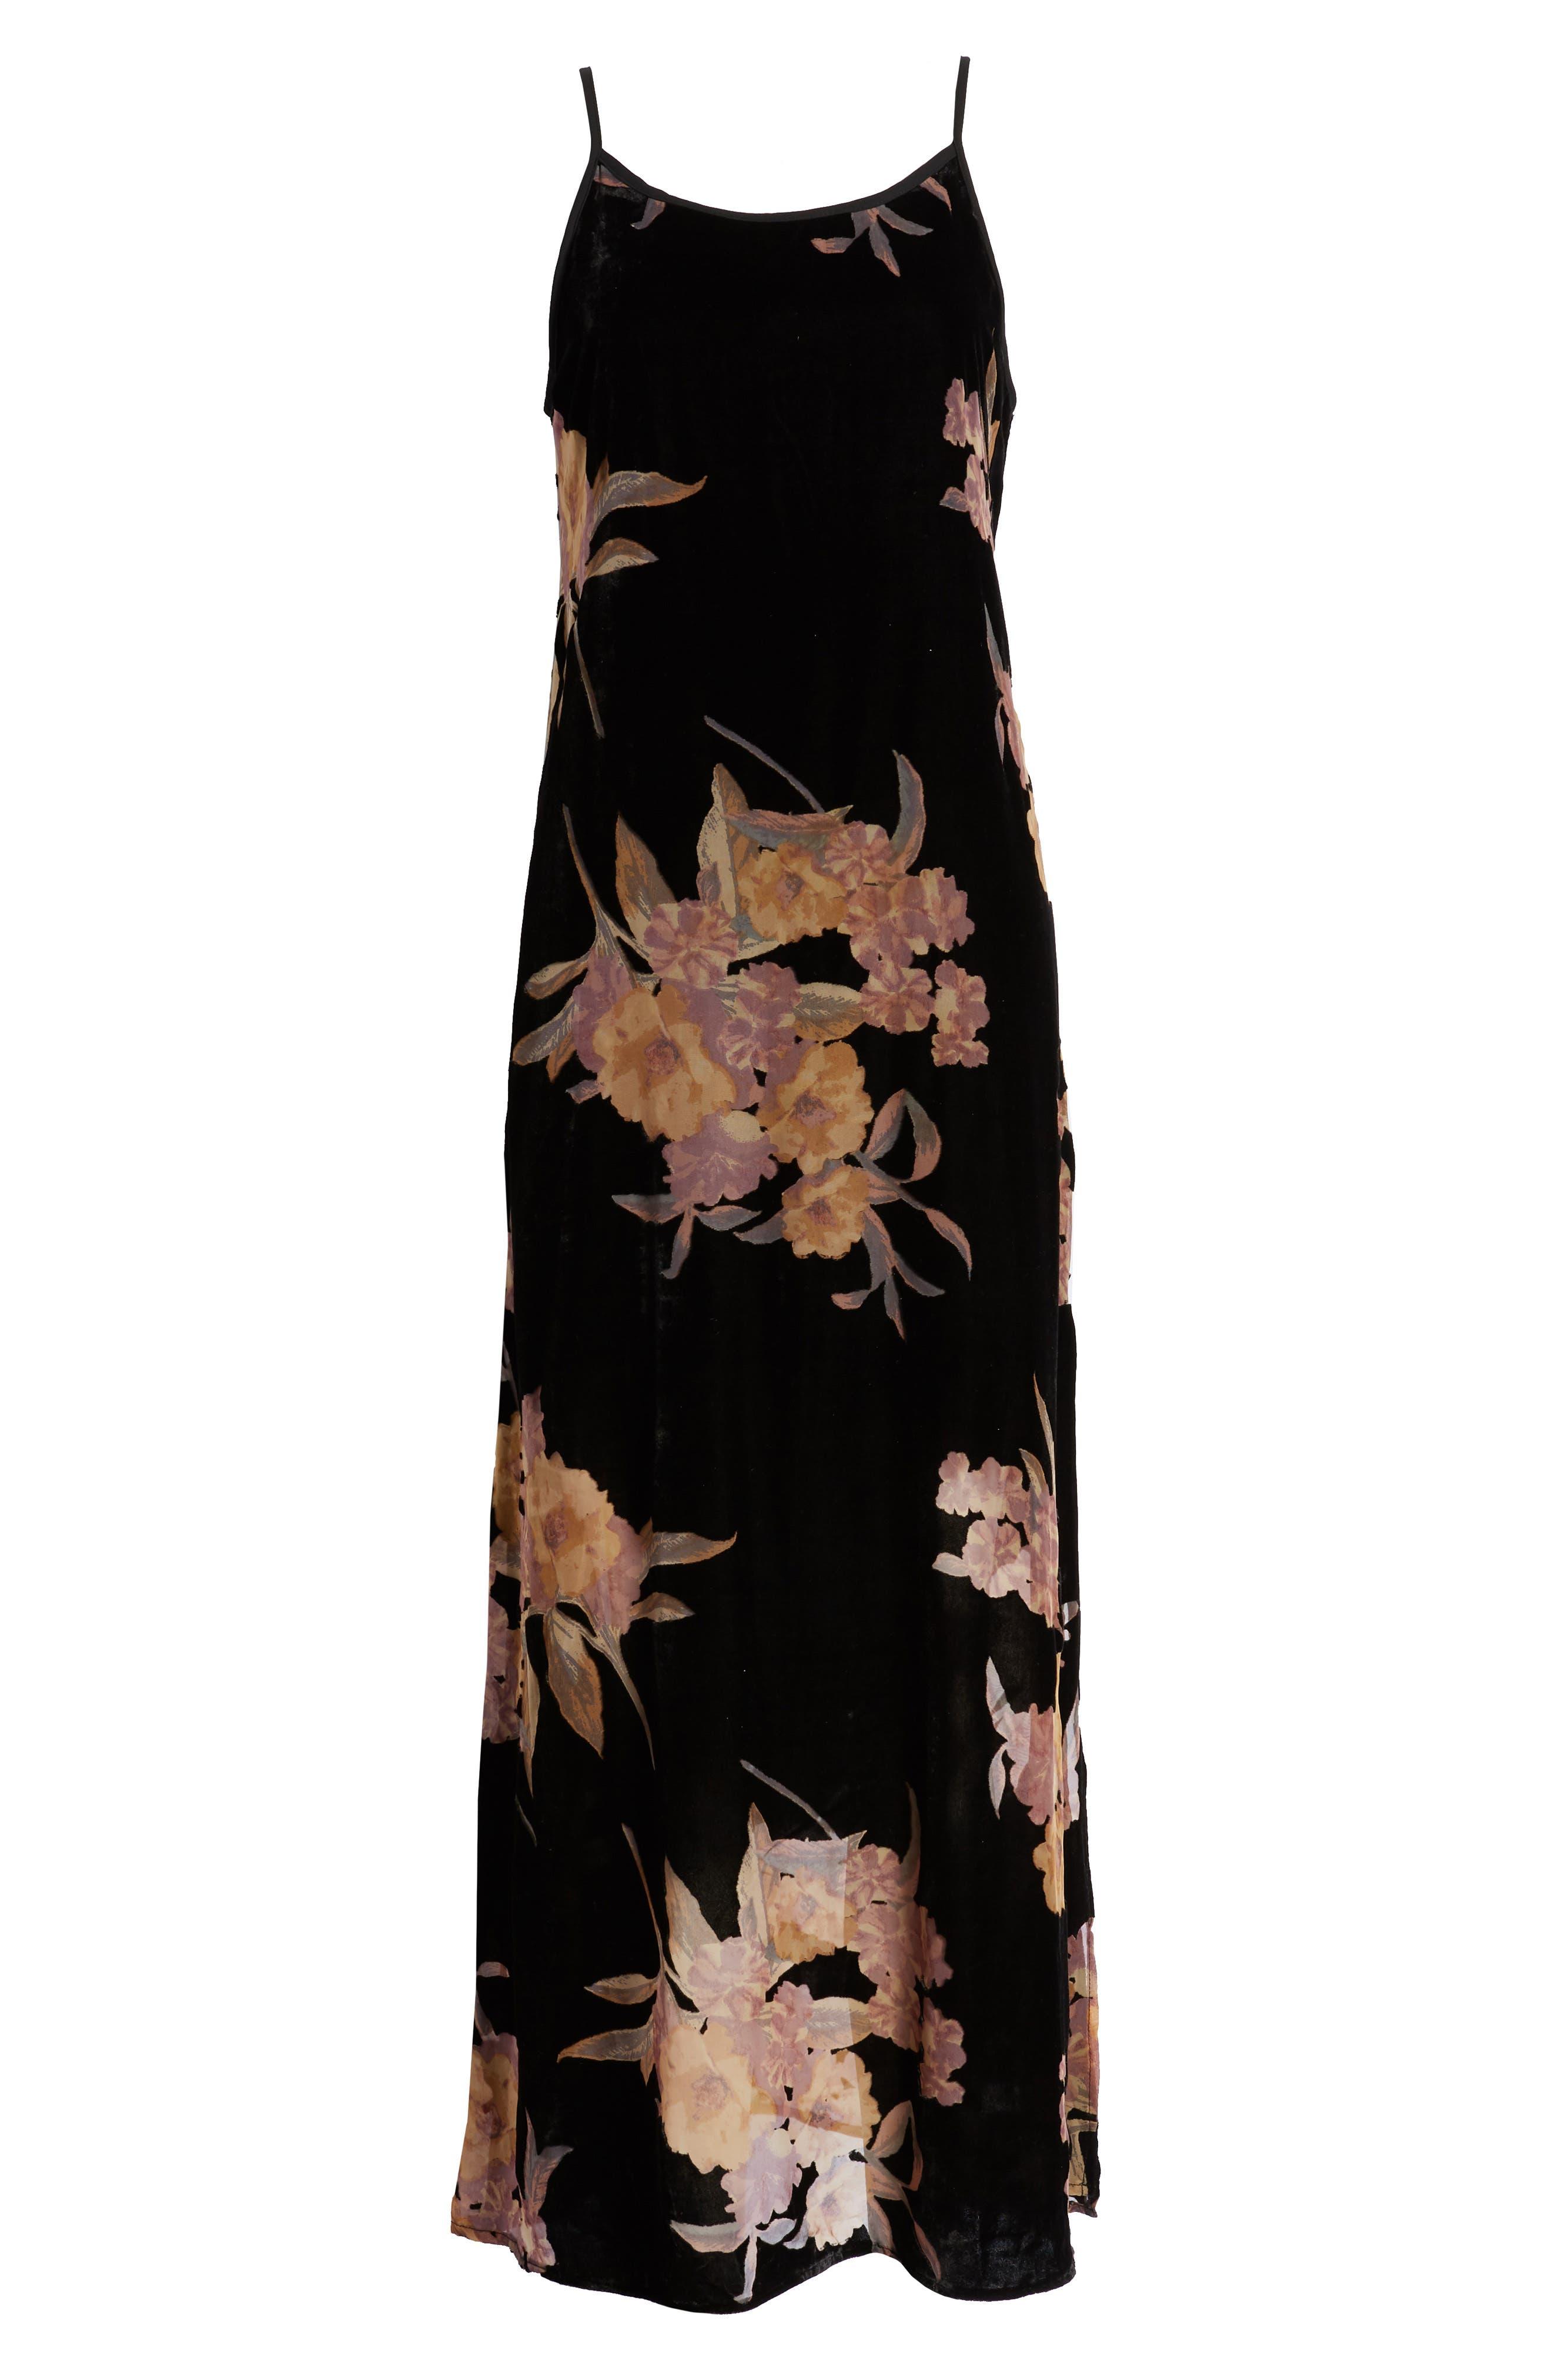 BAND OF GYPSIES,                             Mallorey Floral Print Velvet Dress,                             Alternate thumbnail 7, color,                             001